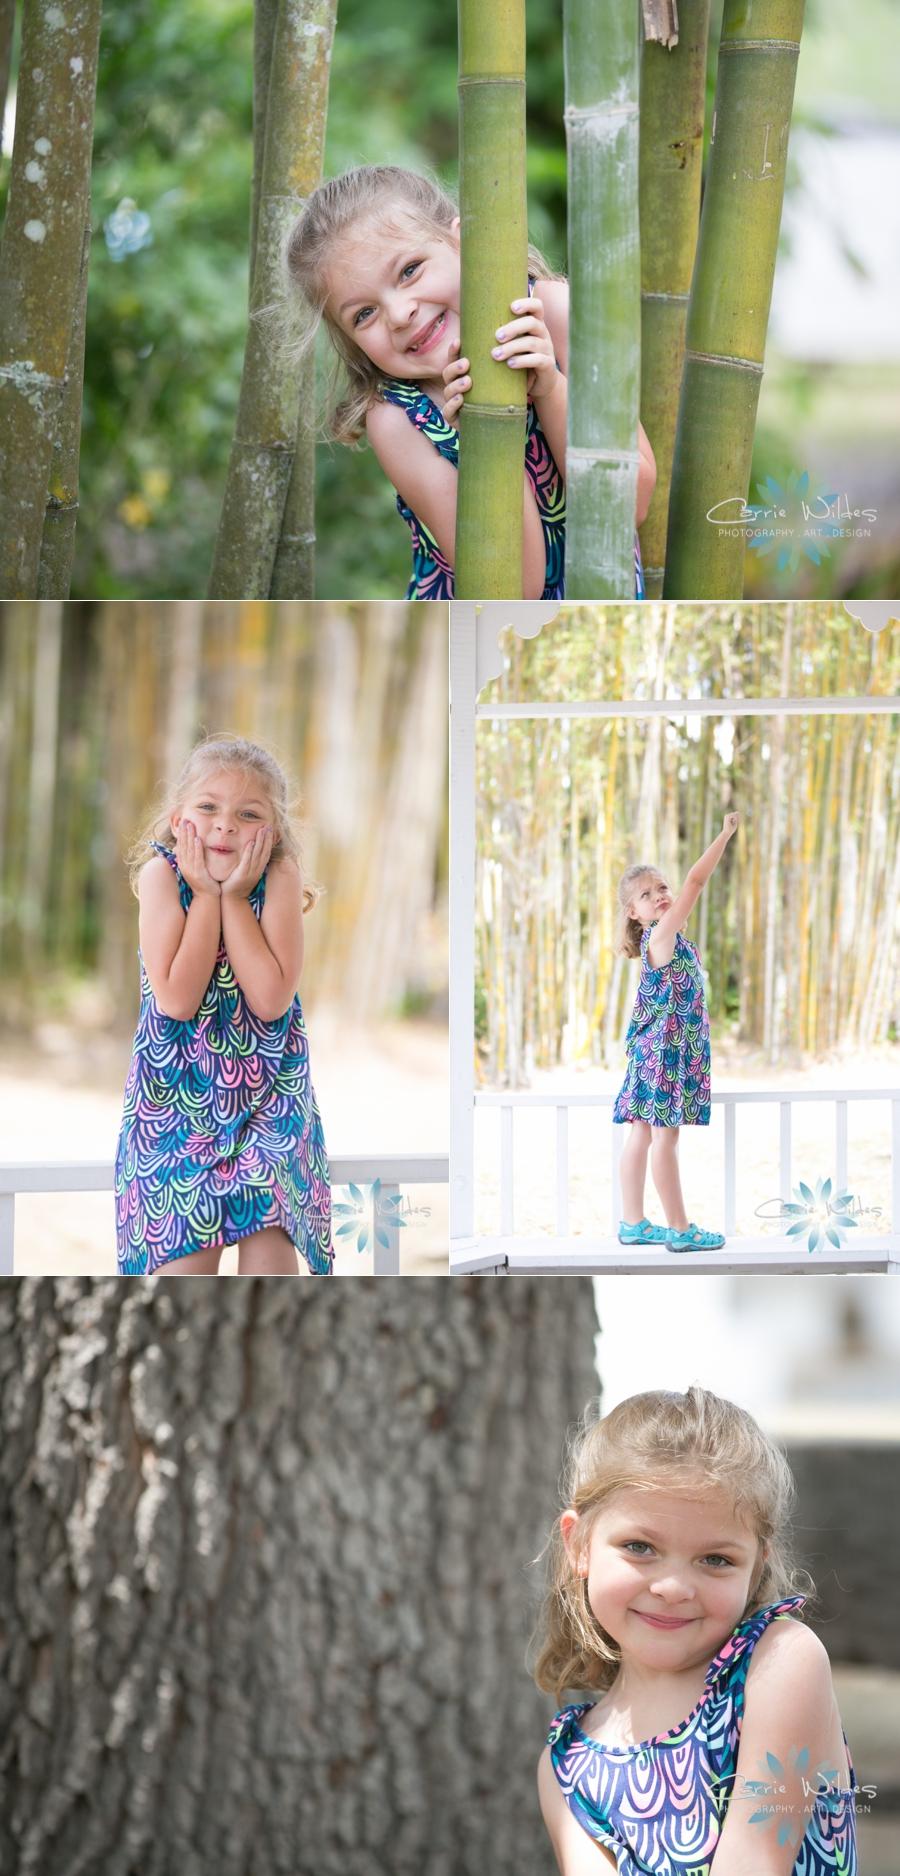 5_3_17 Sophie Sarasota Childrens Portraits_0005.jpg